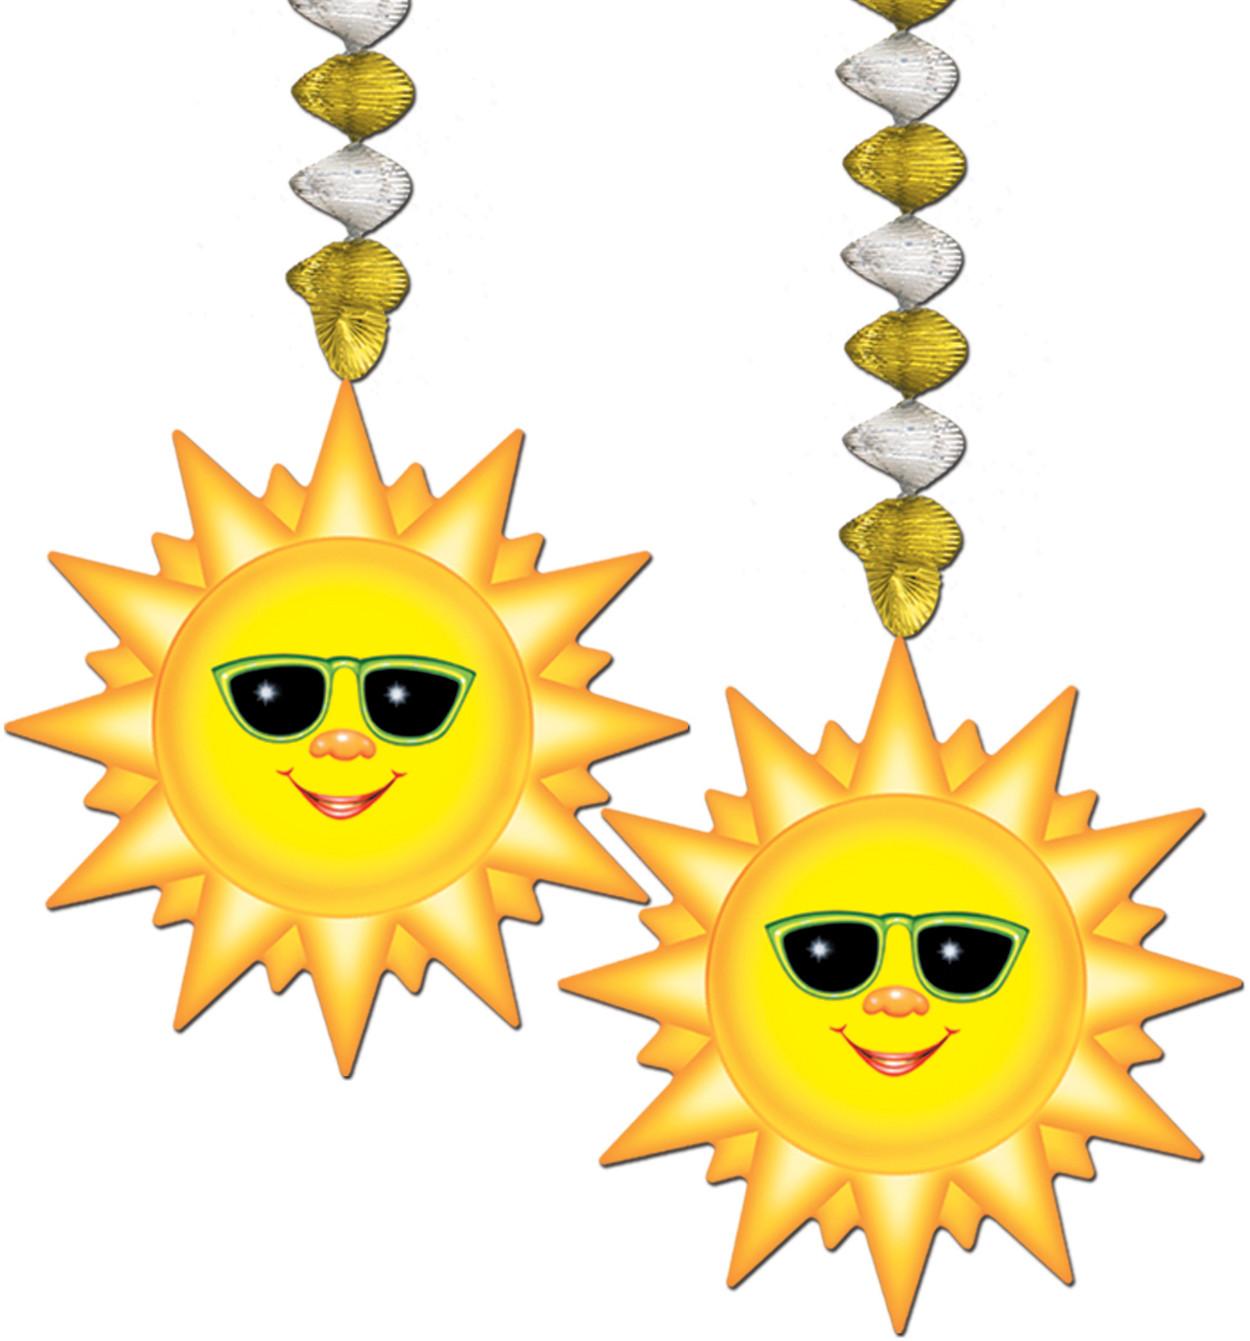 Cartoon Sun Celebration Streamers Hangers Danglers Decoration 2 Pack